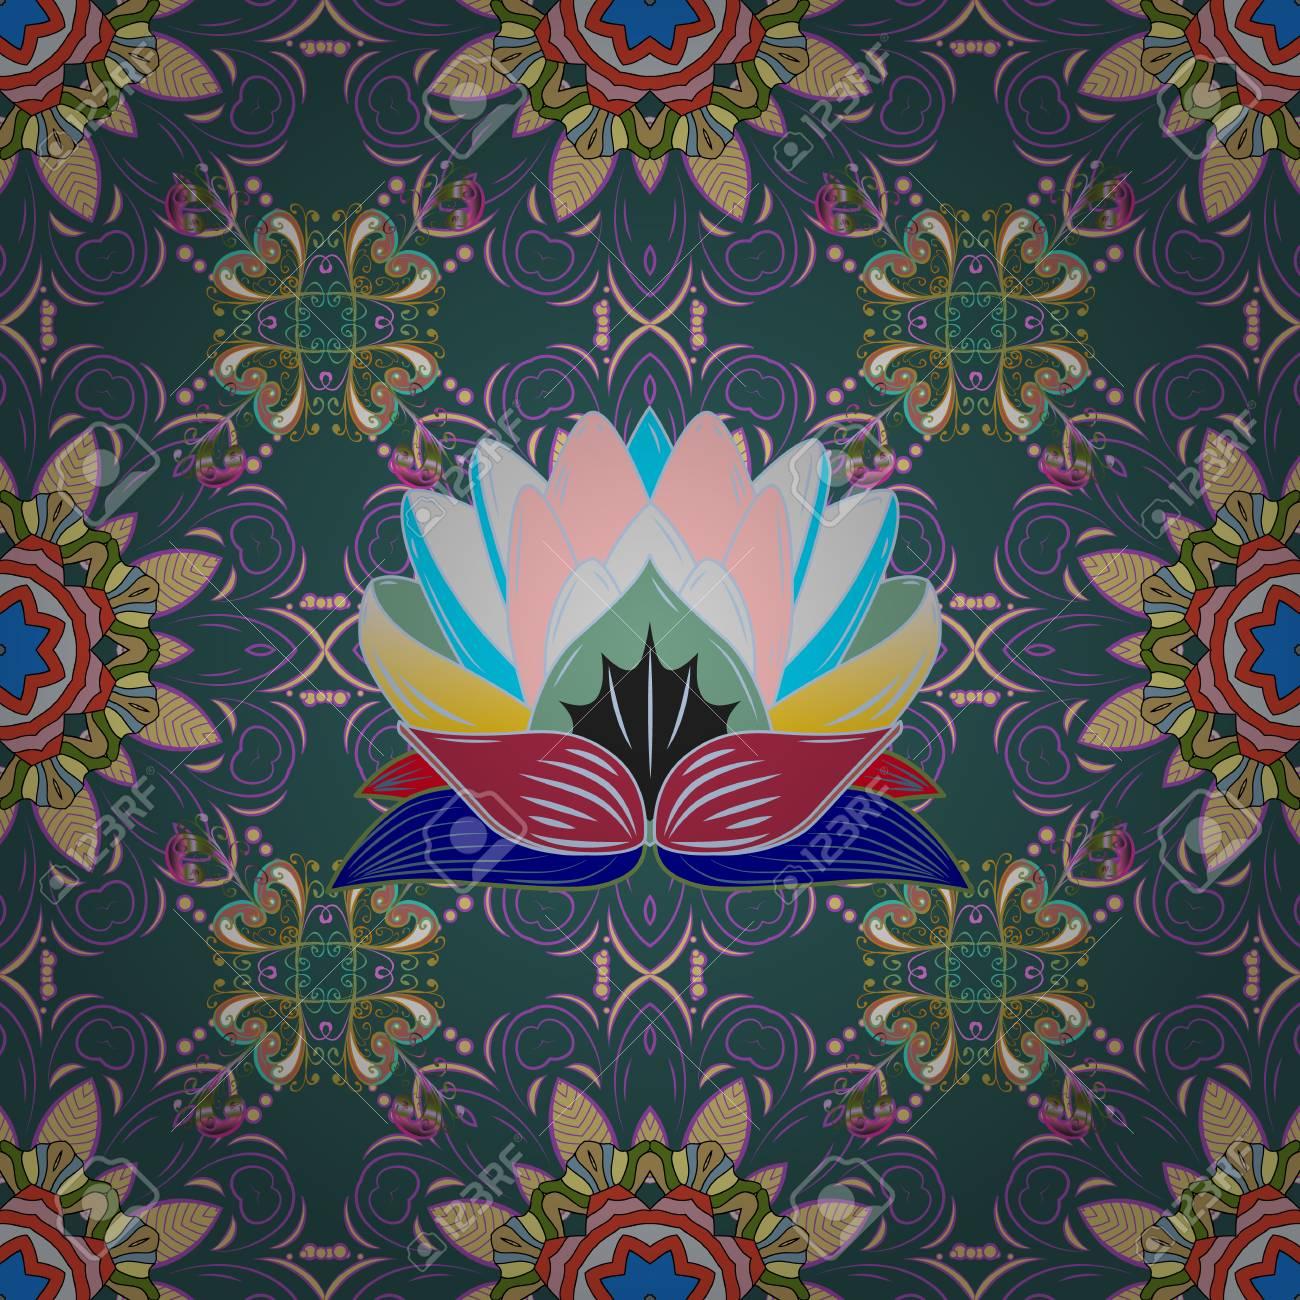 Tribal Art Boho Print Vintage Flower Background Texture